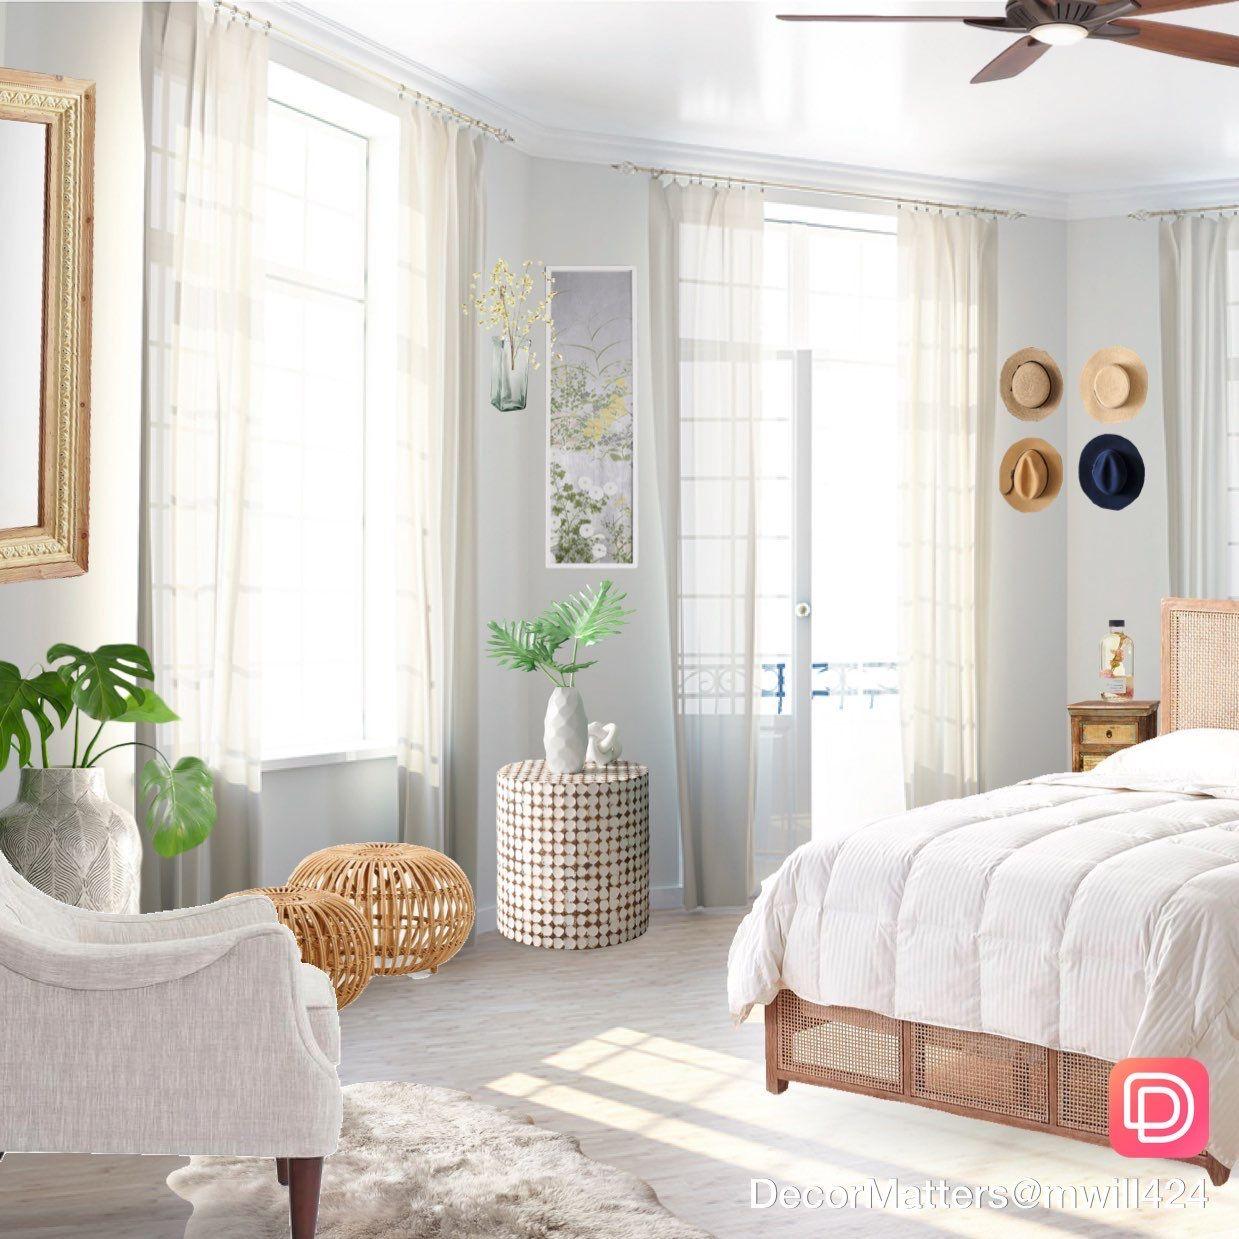 Bright Bedroom Virtual Design Interior Design Apps Interior Design Wooden Bed Frames Bedroom design apps free